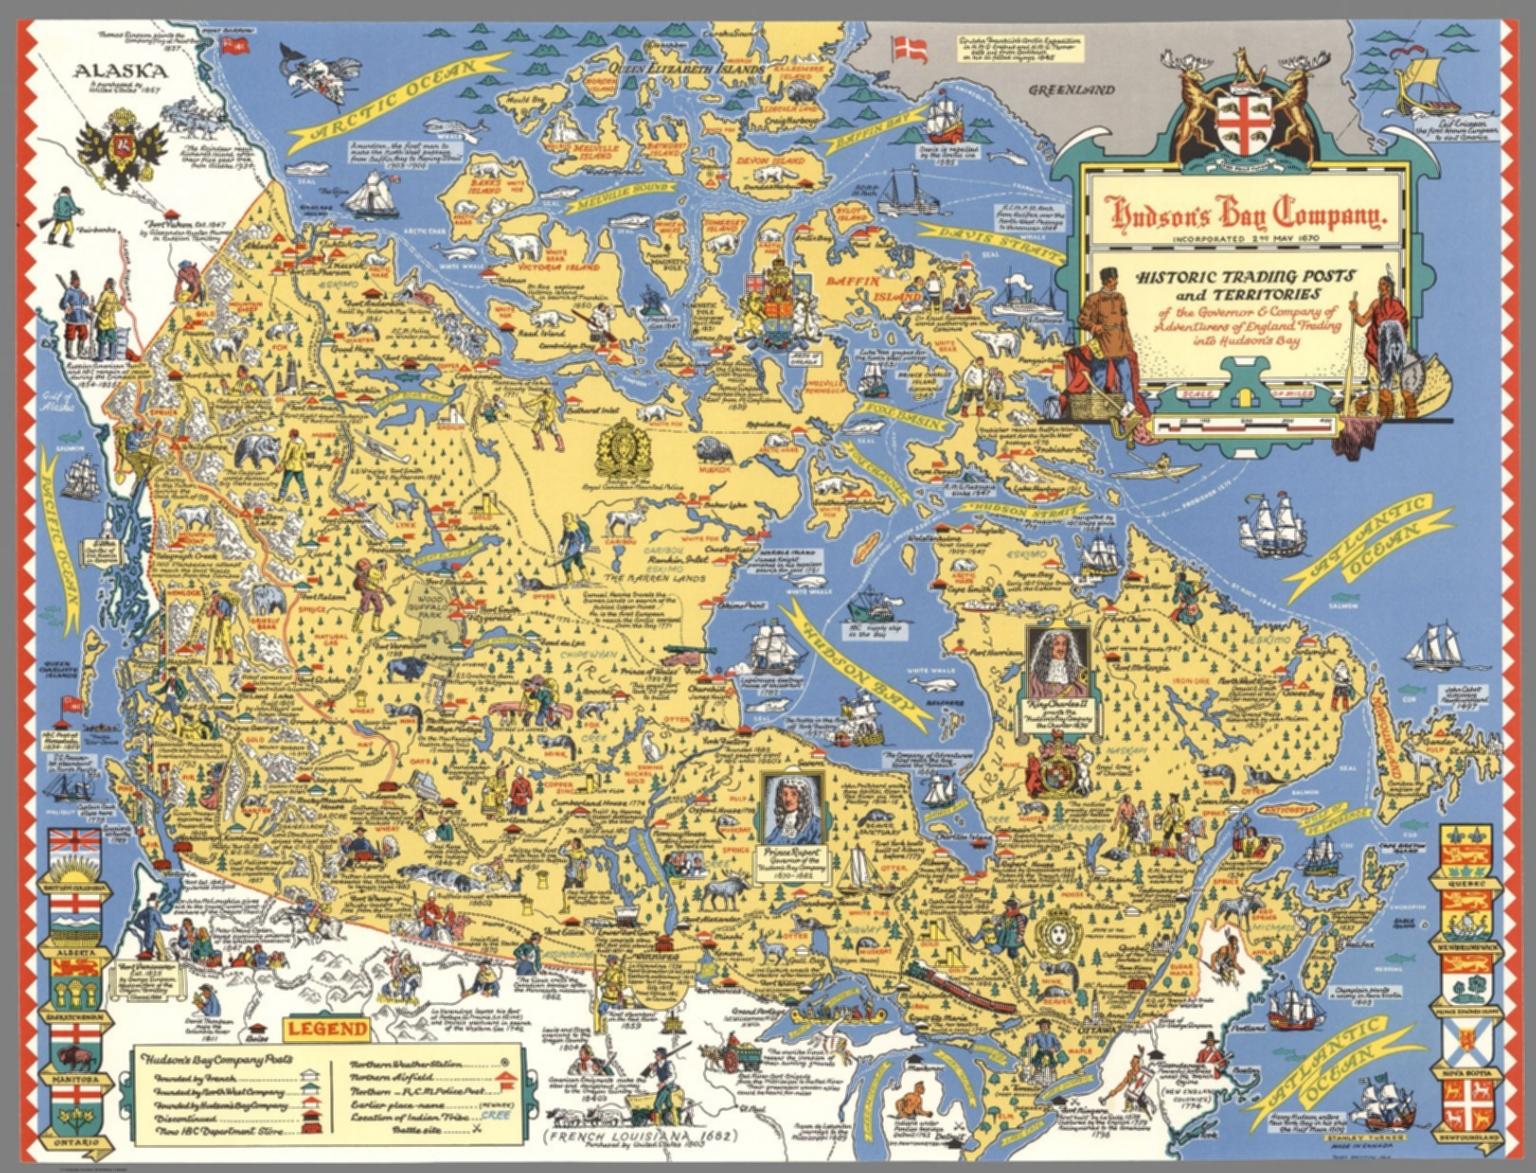 Hudsons Bay Company Historic trading posts David Rumsey